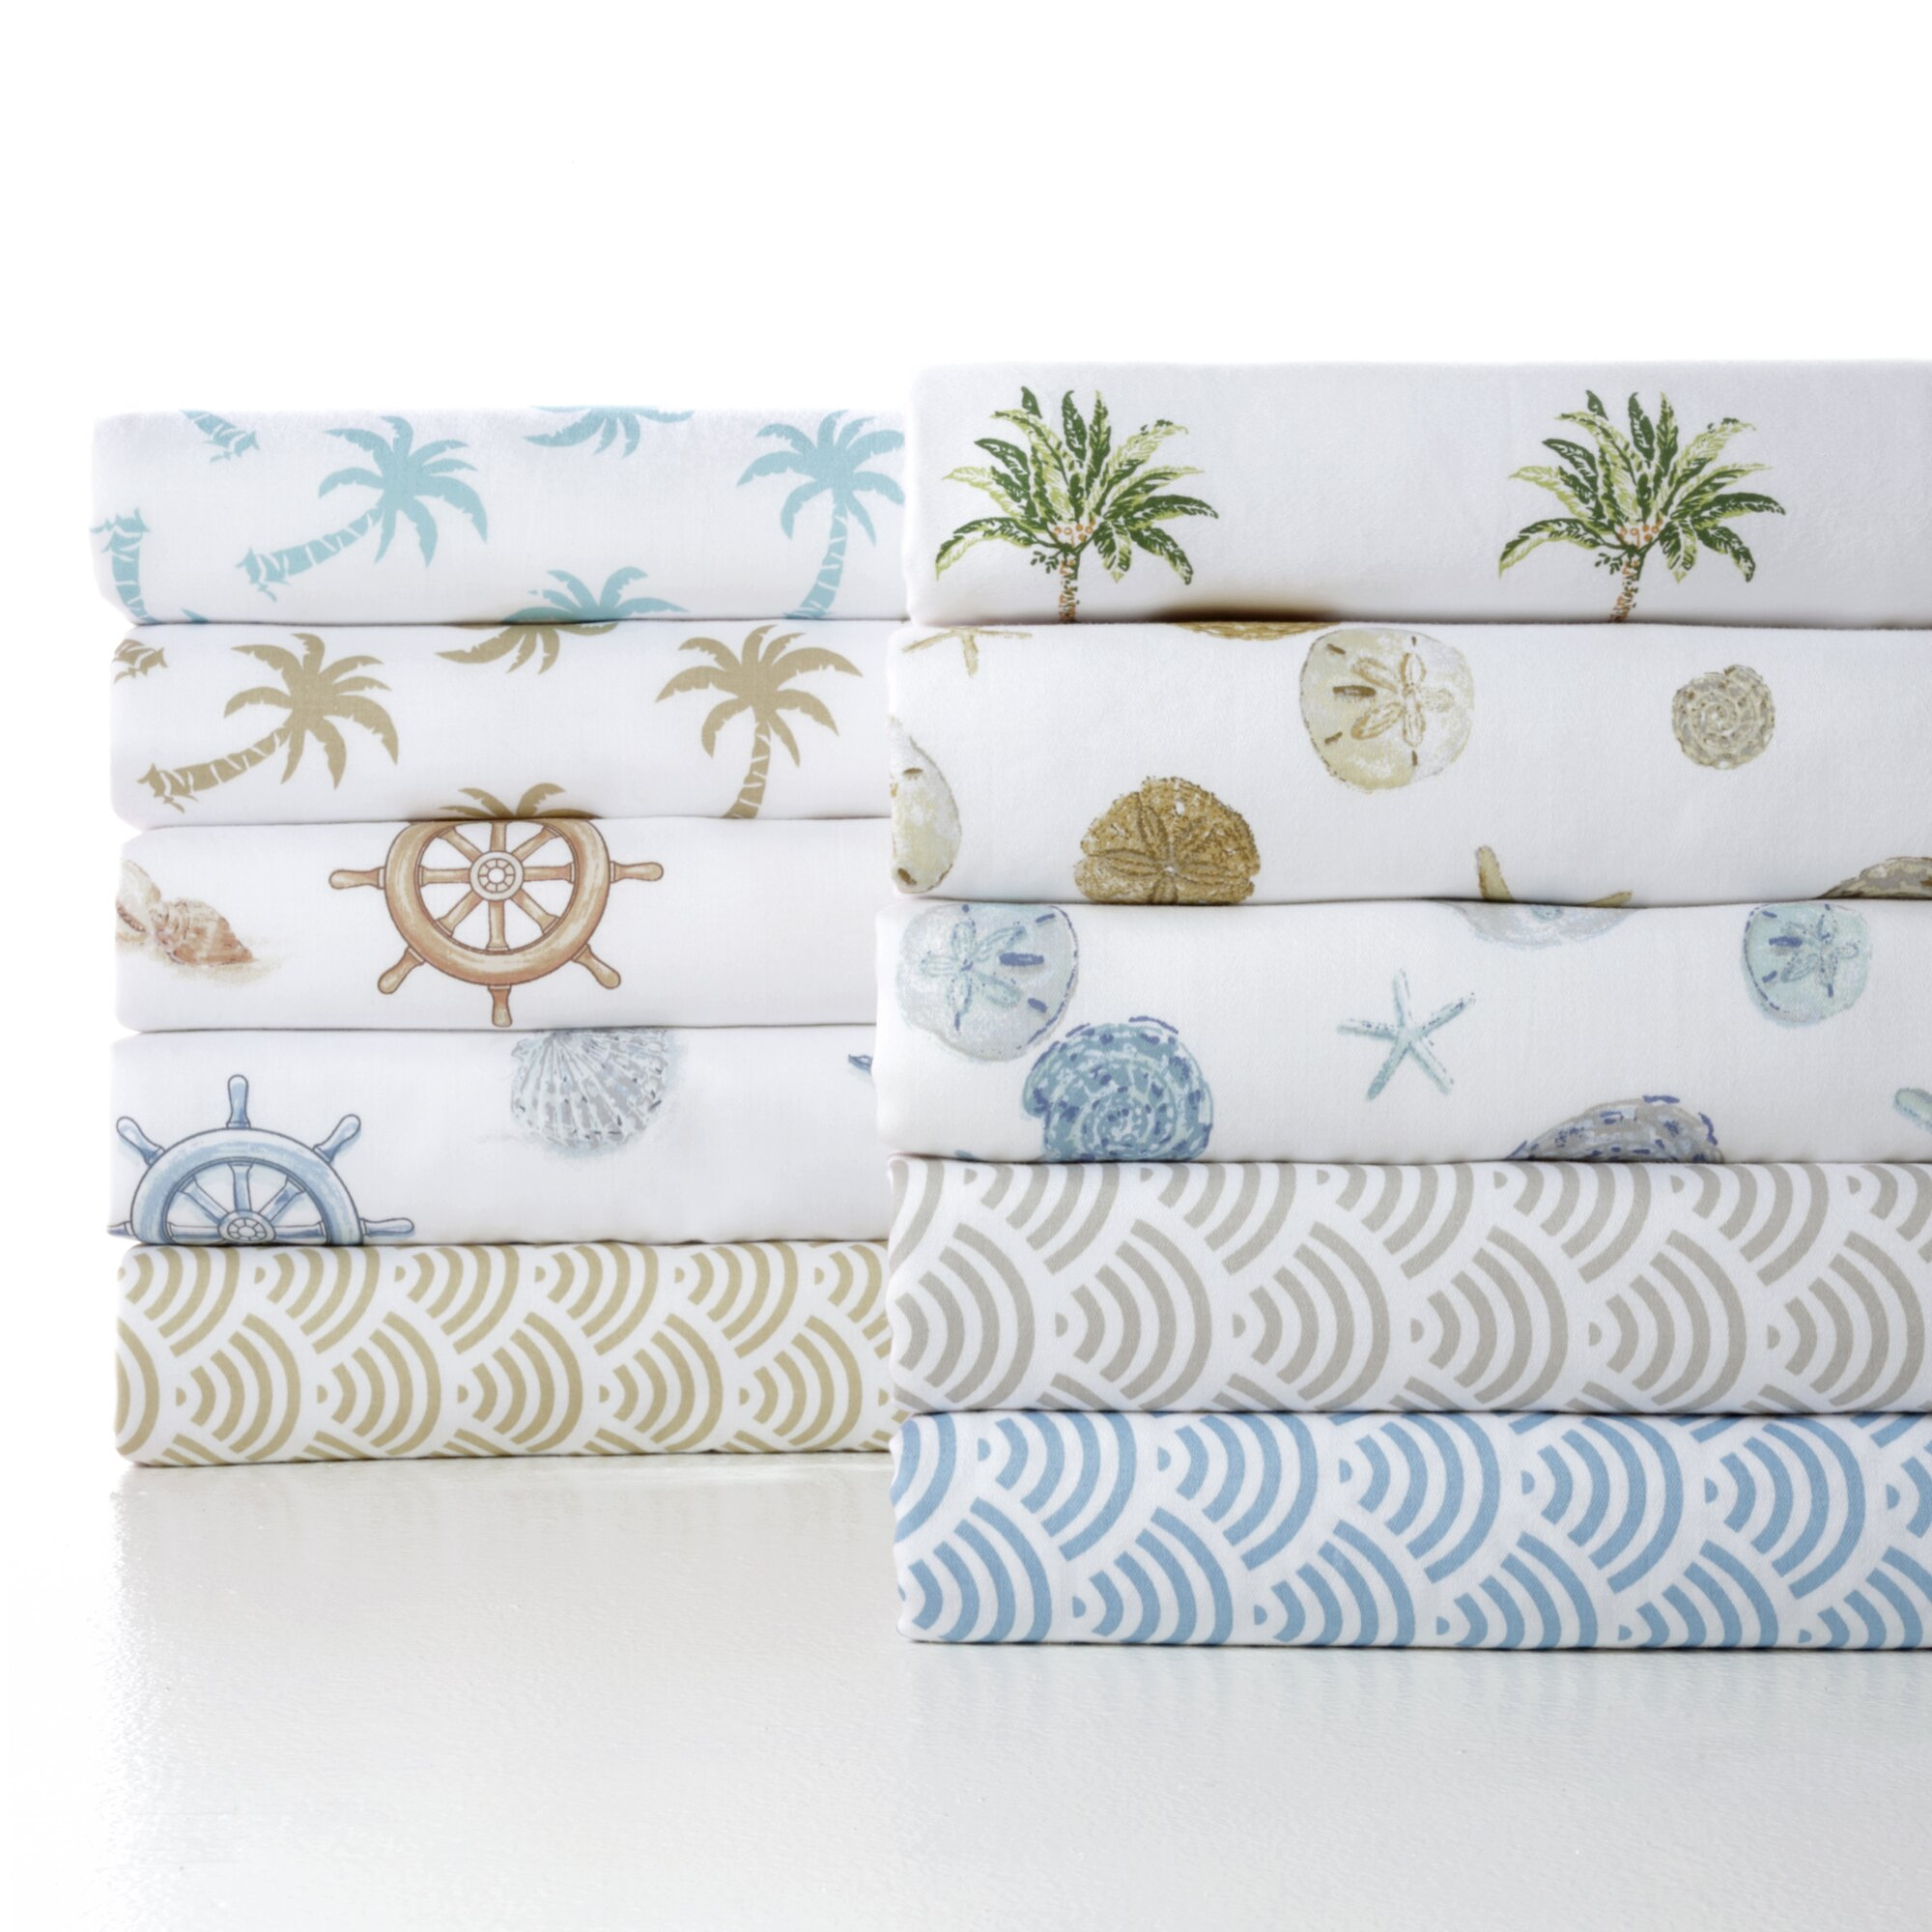 panama jack nautical 300 thread count cotton sheet set reviews wayfair. Black Bedroom Furniture Sets. Home Design Ideas